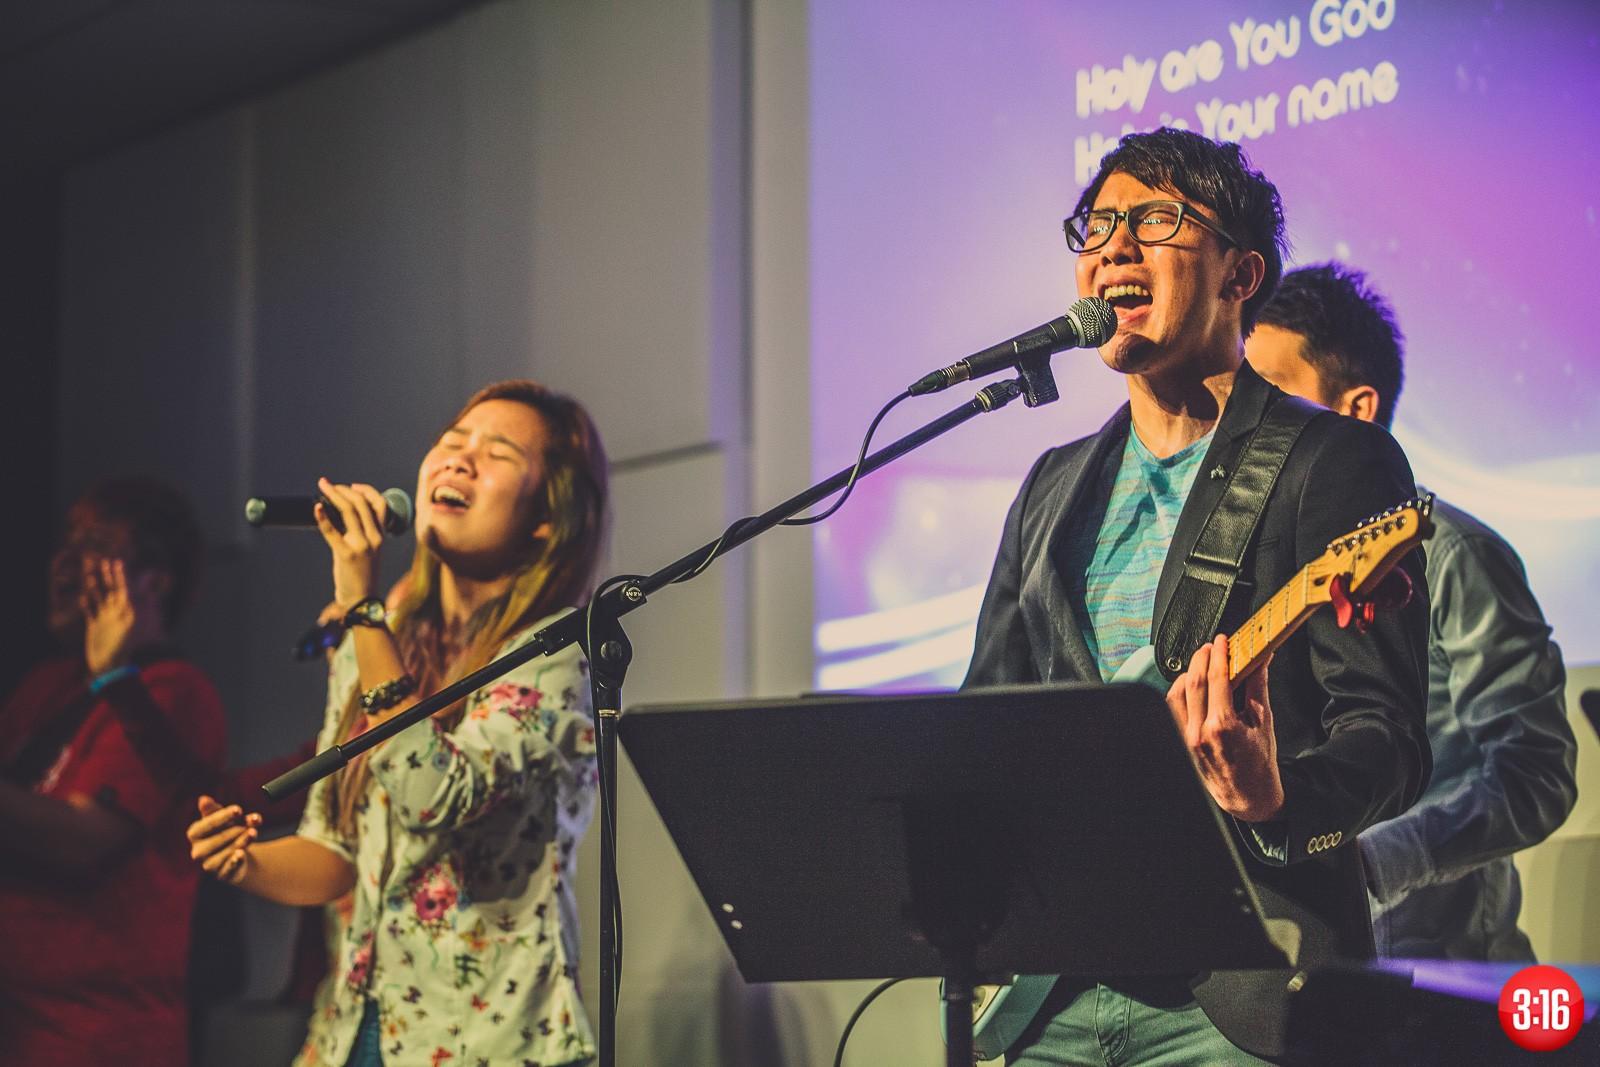 3:16 Church's Worship Experience